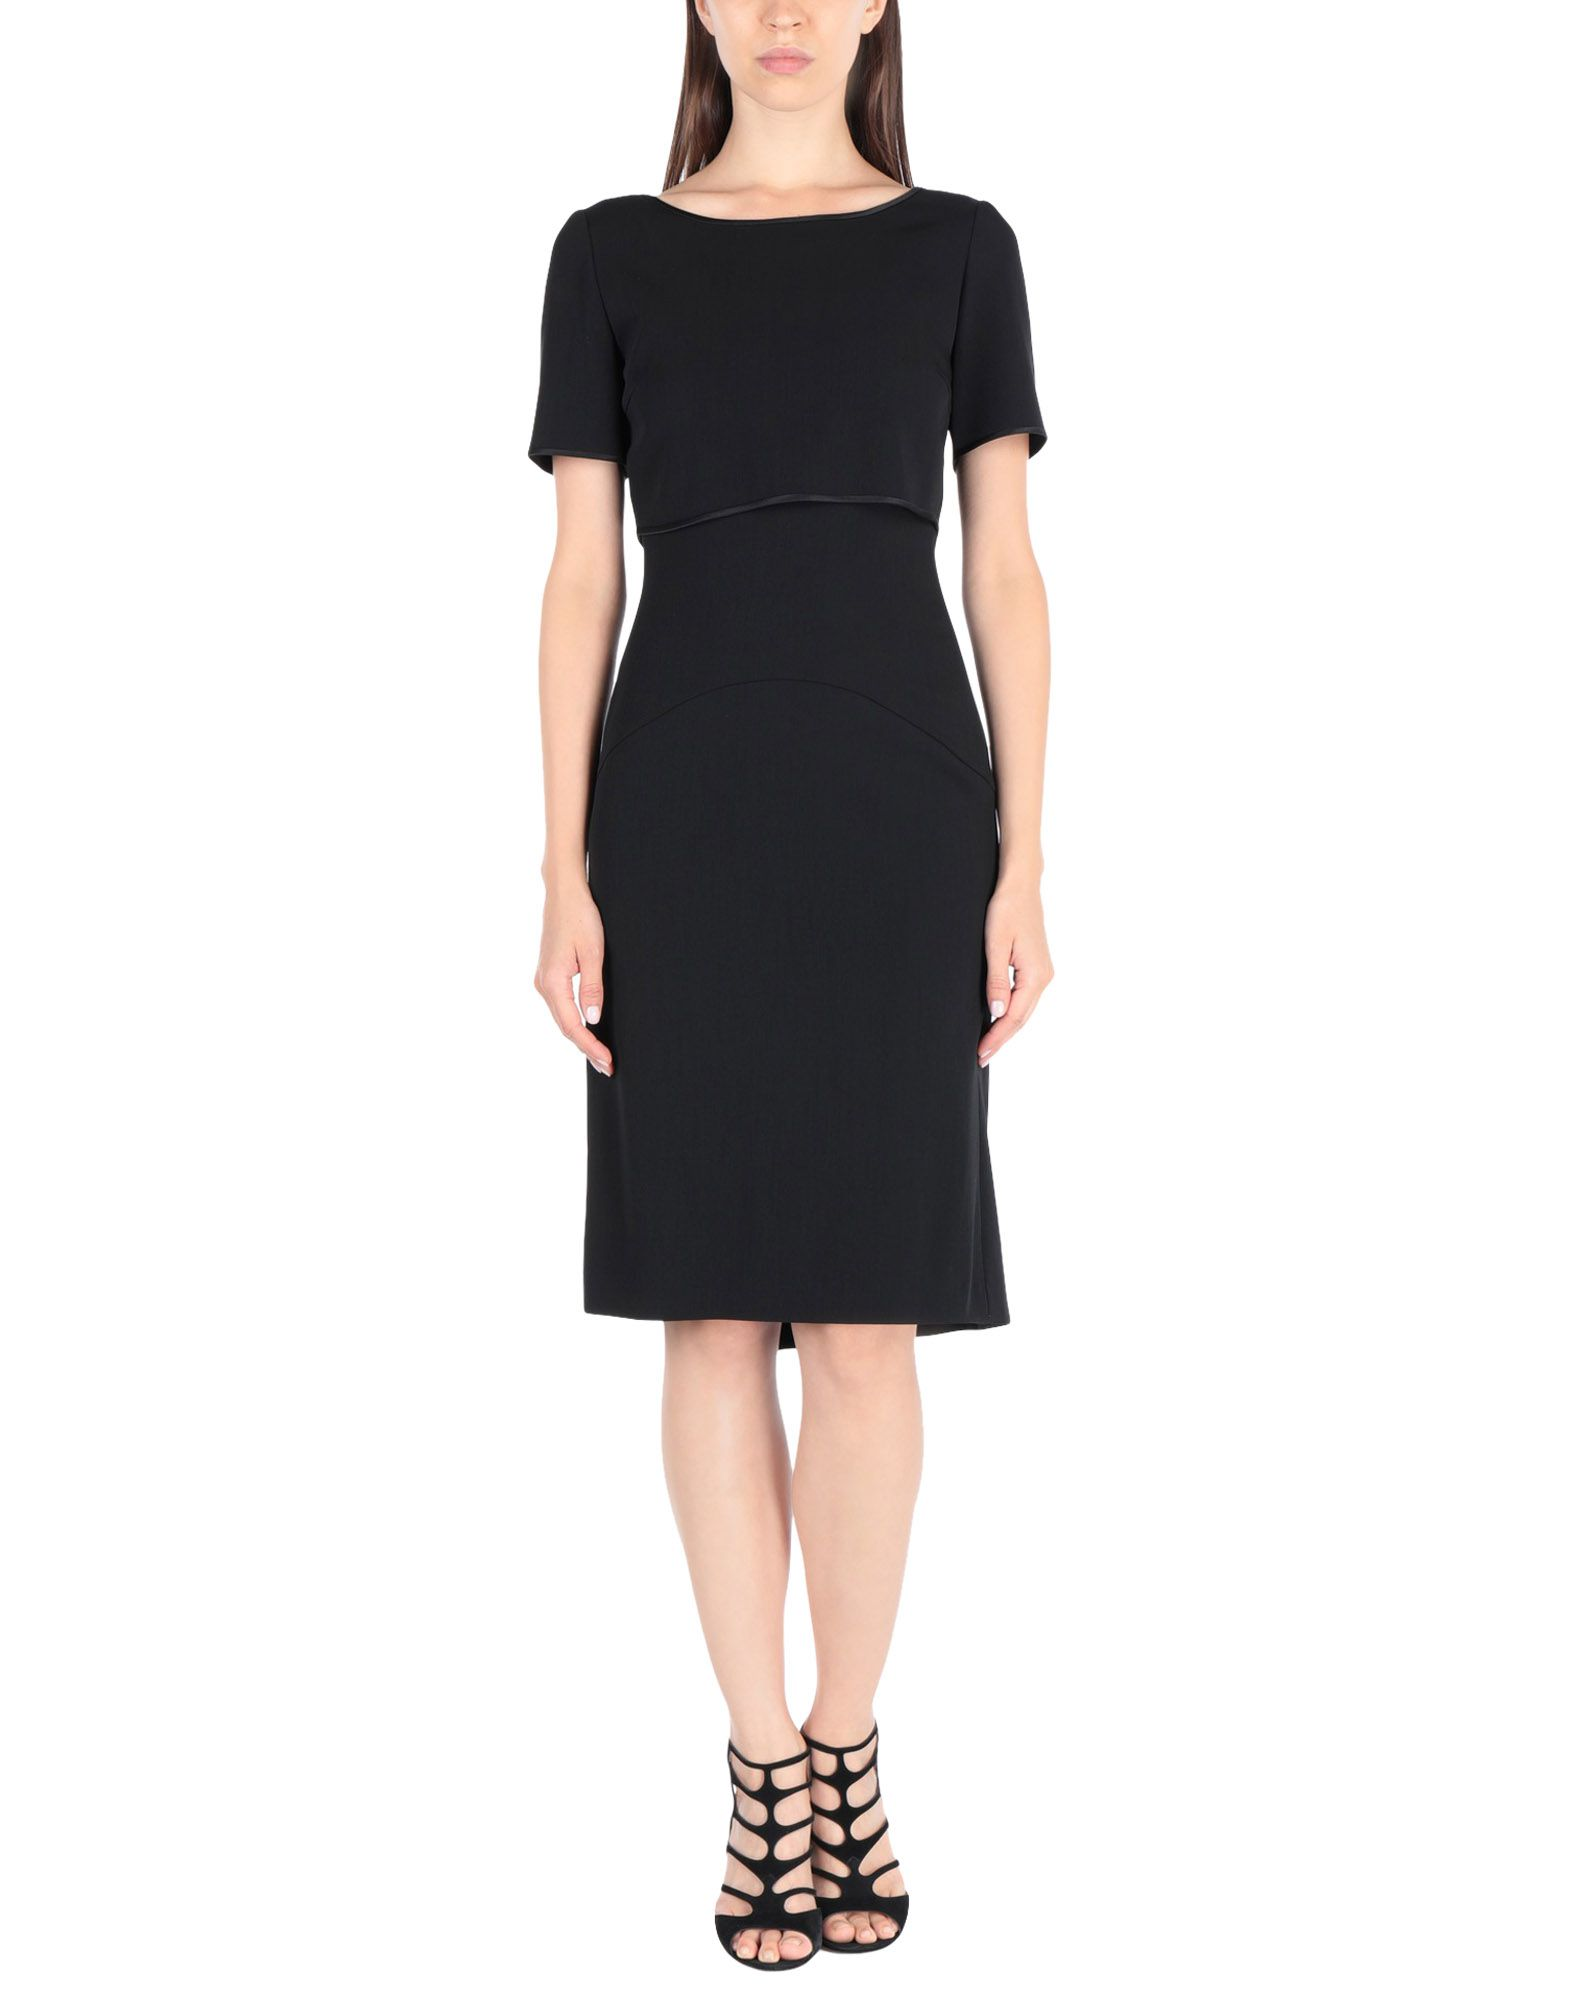 ALBERTA FERRETTI Damen Outfit Farbe Schwarz Größe 3